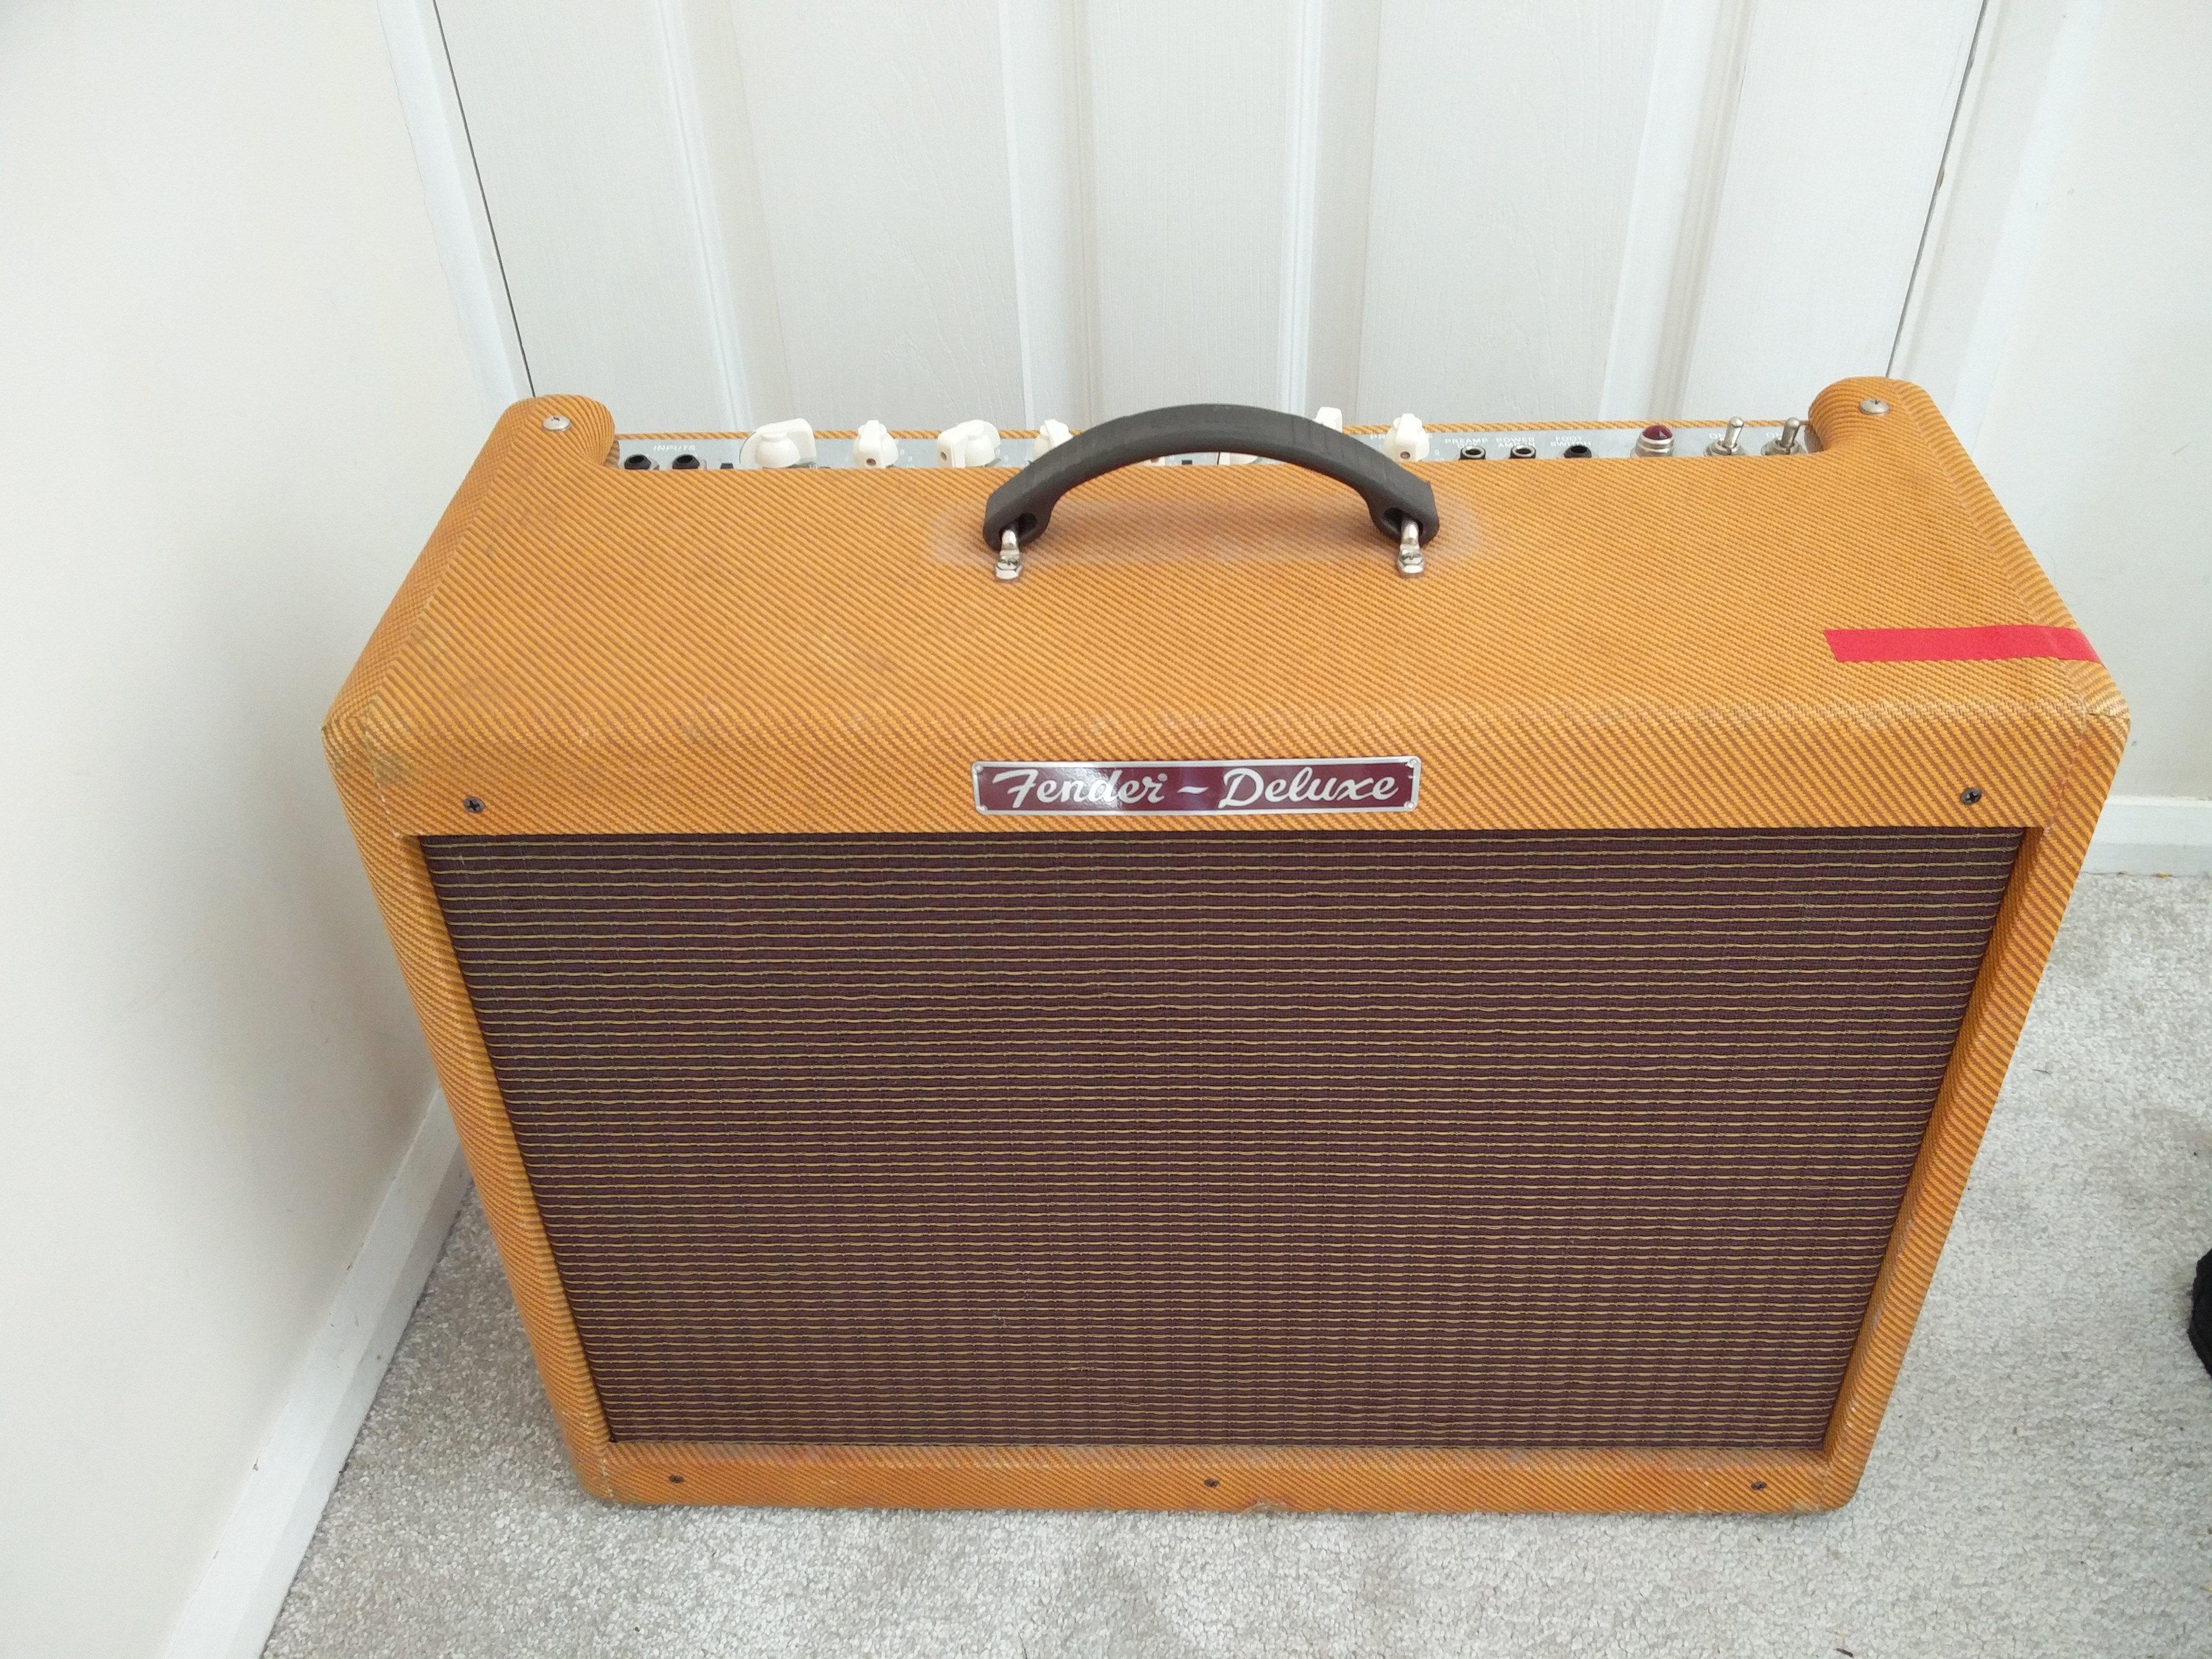 [SCHEMATICS_49CH]  Fender Hod Rod Deluxe Repair - Keld Ampworks, Newark, Nottingham, Lincoln | Fender Deville Input Jack Wiring |  | Keld Ampworks